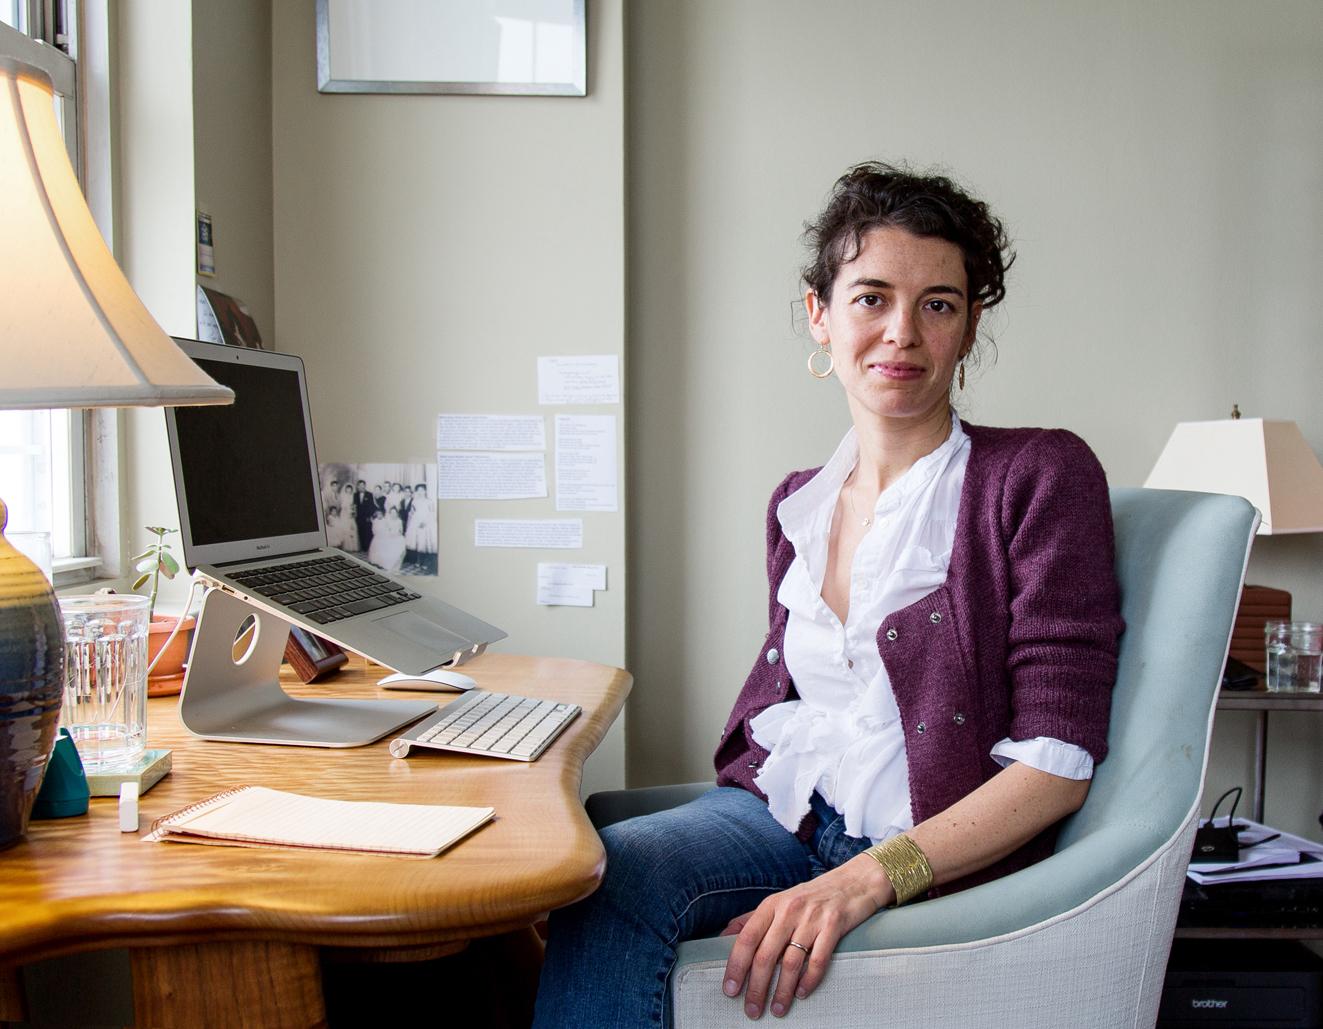 Meet Playwright and Author Quiara Alegría Hudes